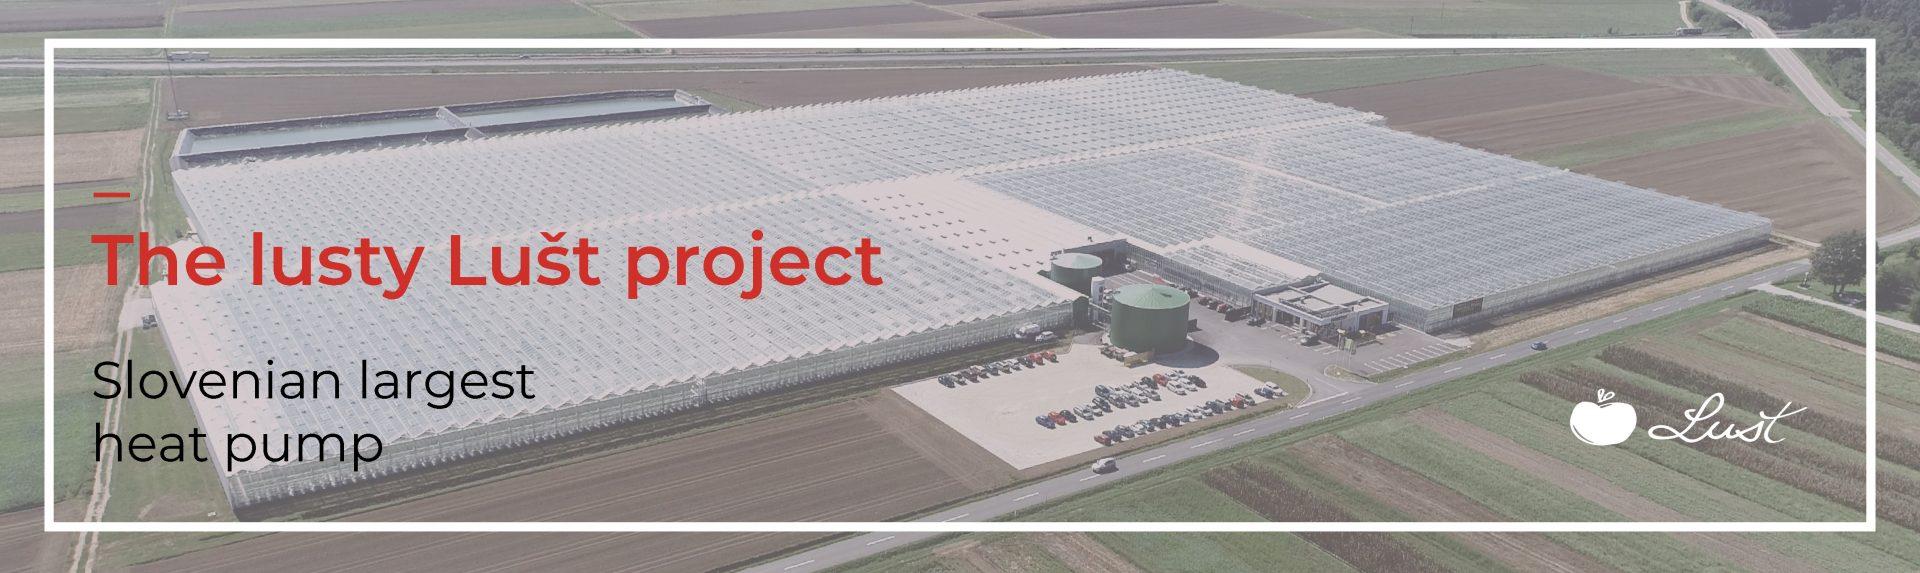 2019_03_18 LUŠTen projekt banner spletna stran_ENG